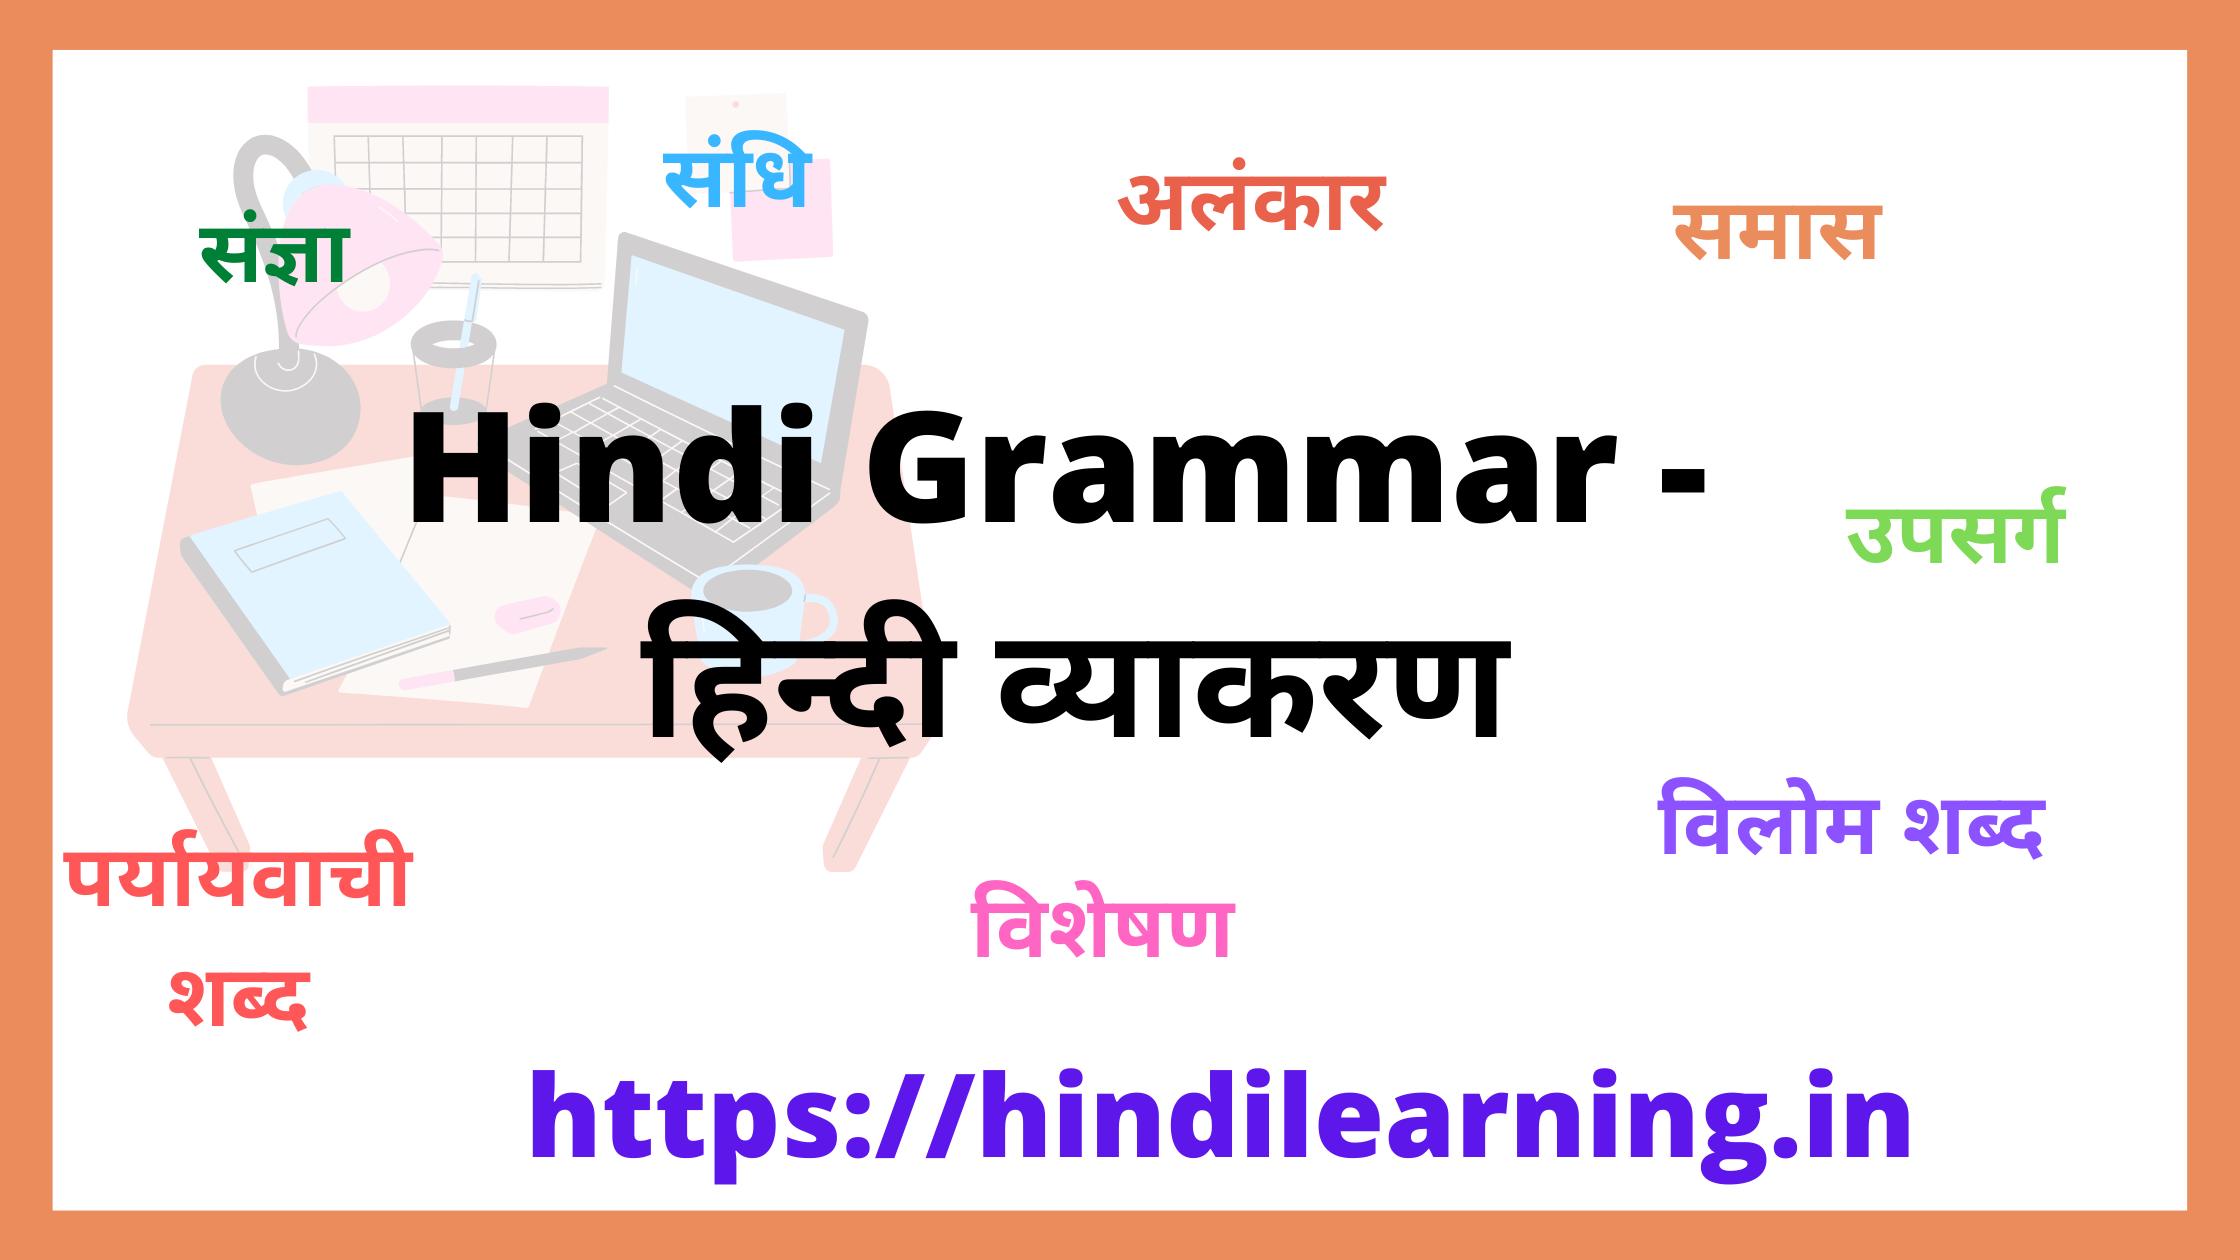 Hindi Grammar - हिंदी व्याकरण